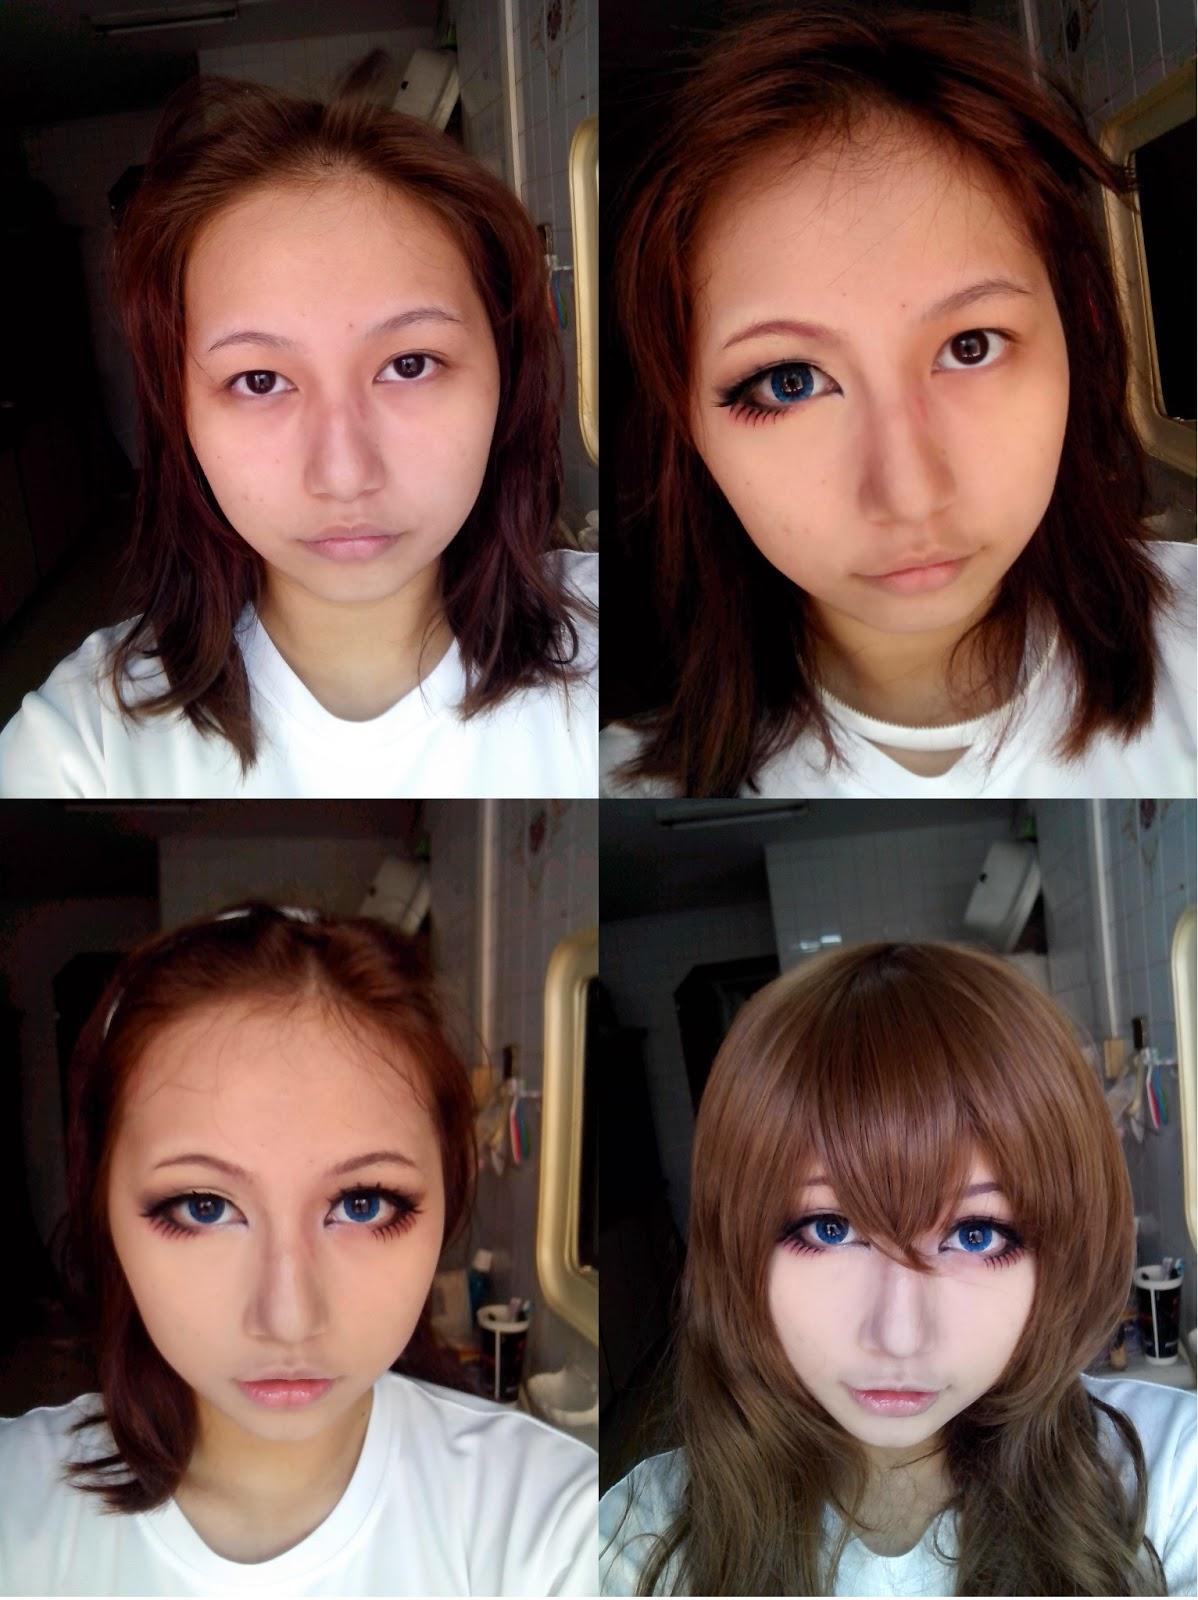 14 foto before dan after make up cosplay yang bikin kamu melongo